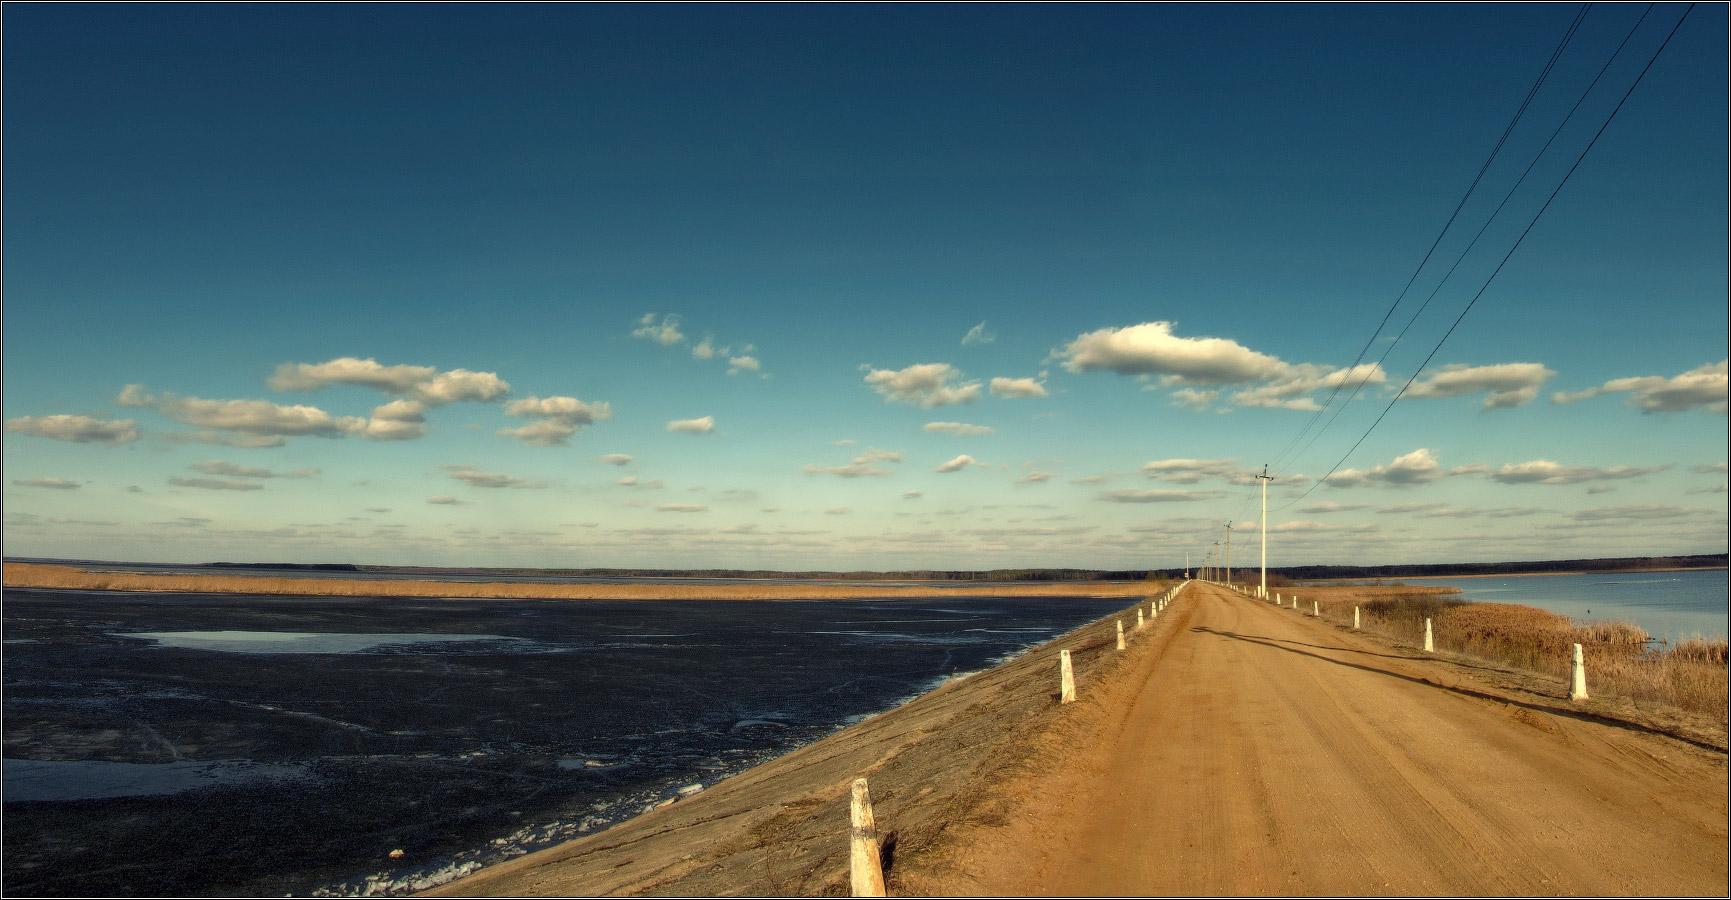 http://i4.imageban.ru/out/2012/03/25/bc66a3e4b08f489e6bd5ffd46f4526d9.jpg